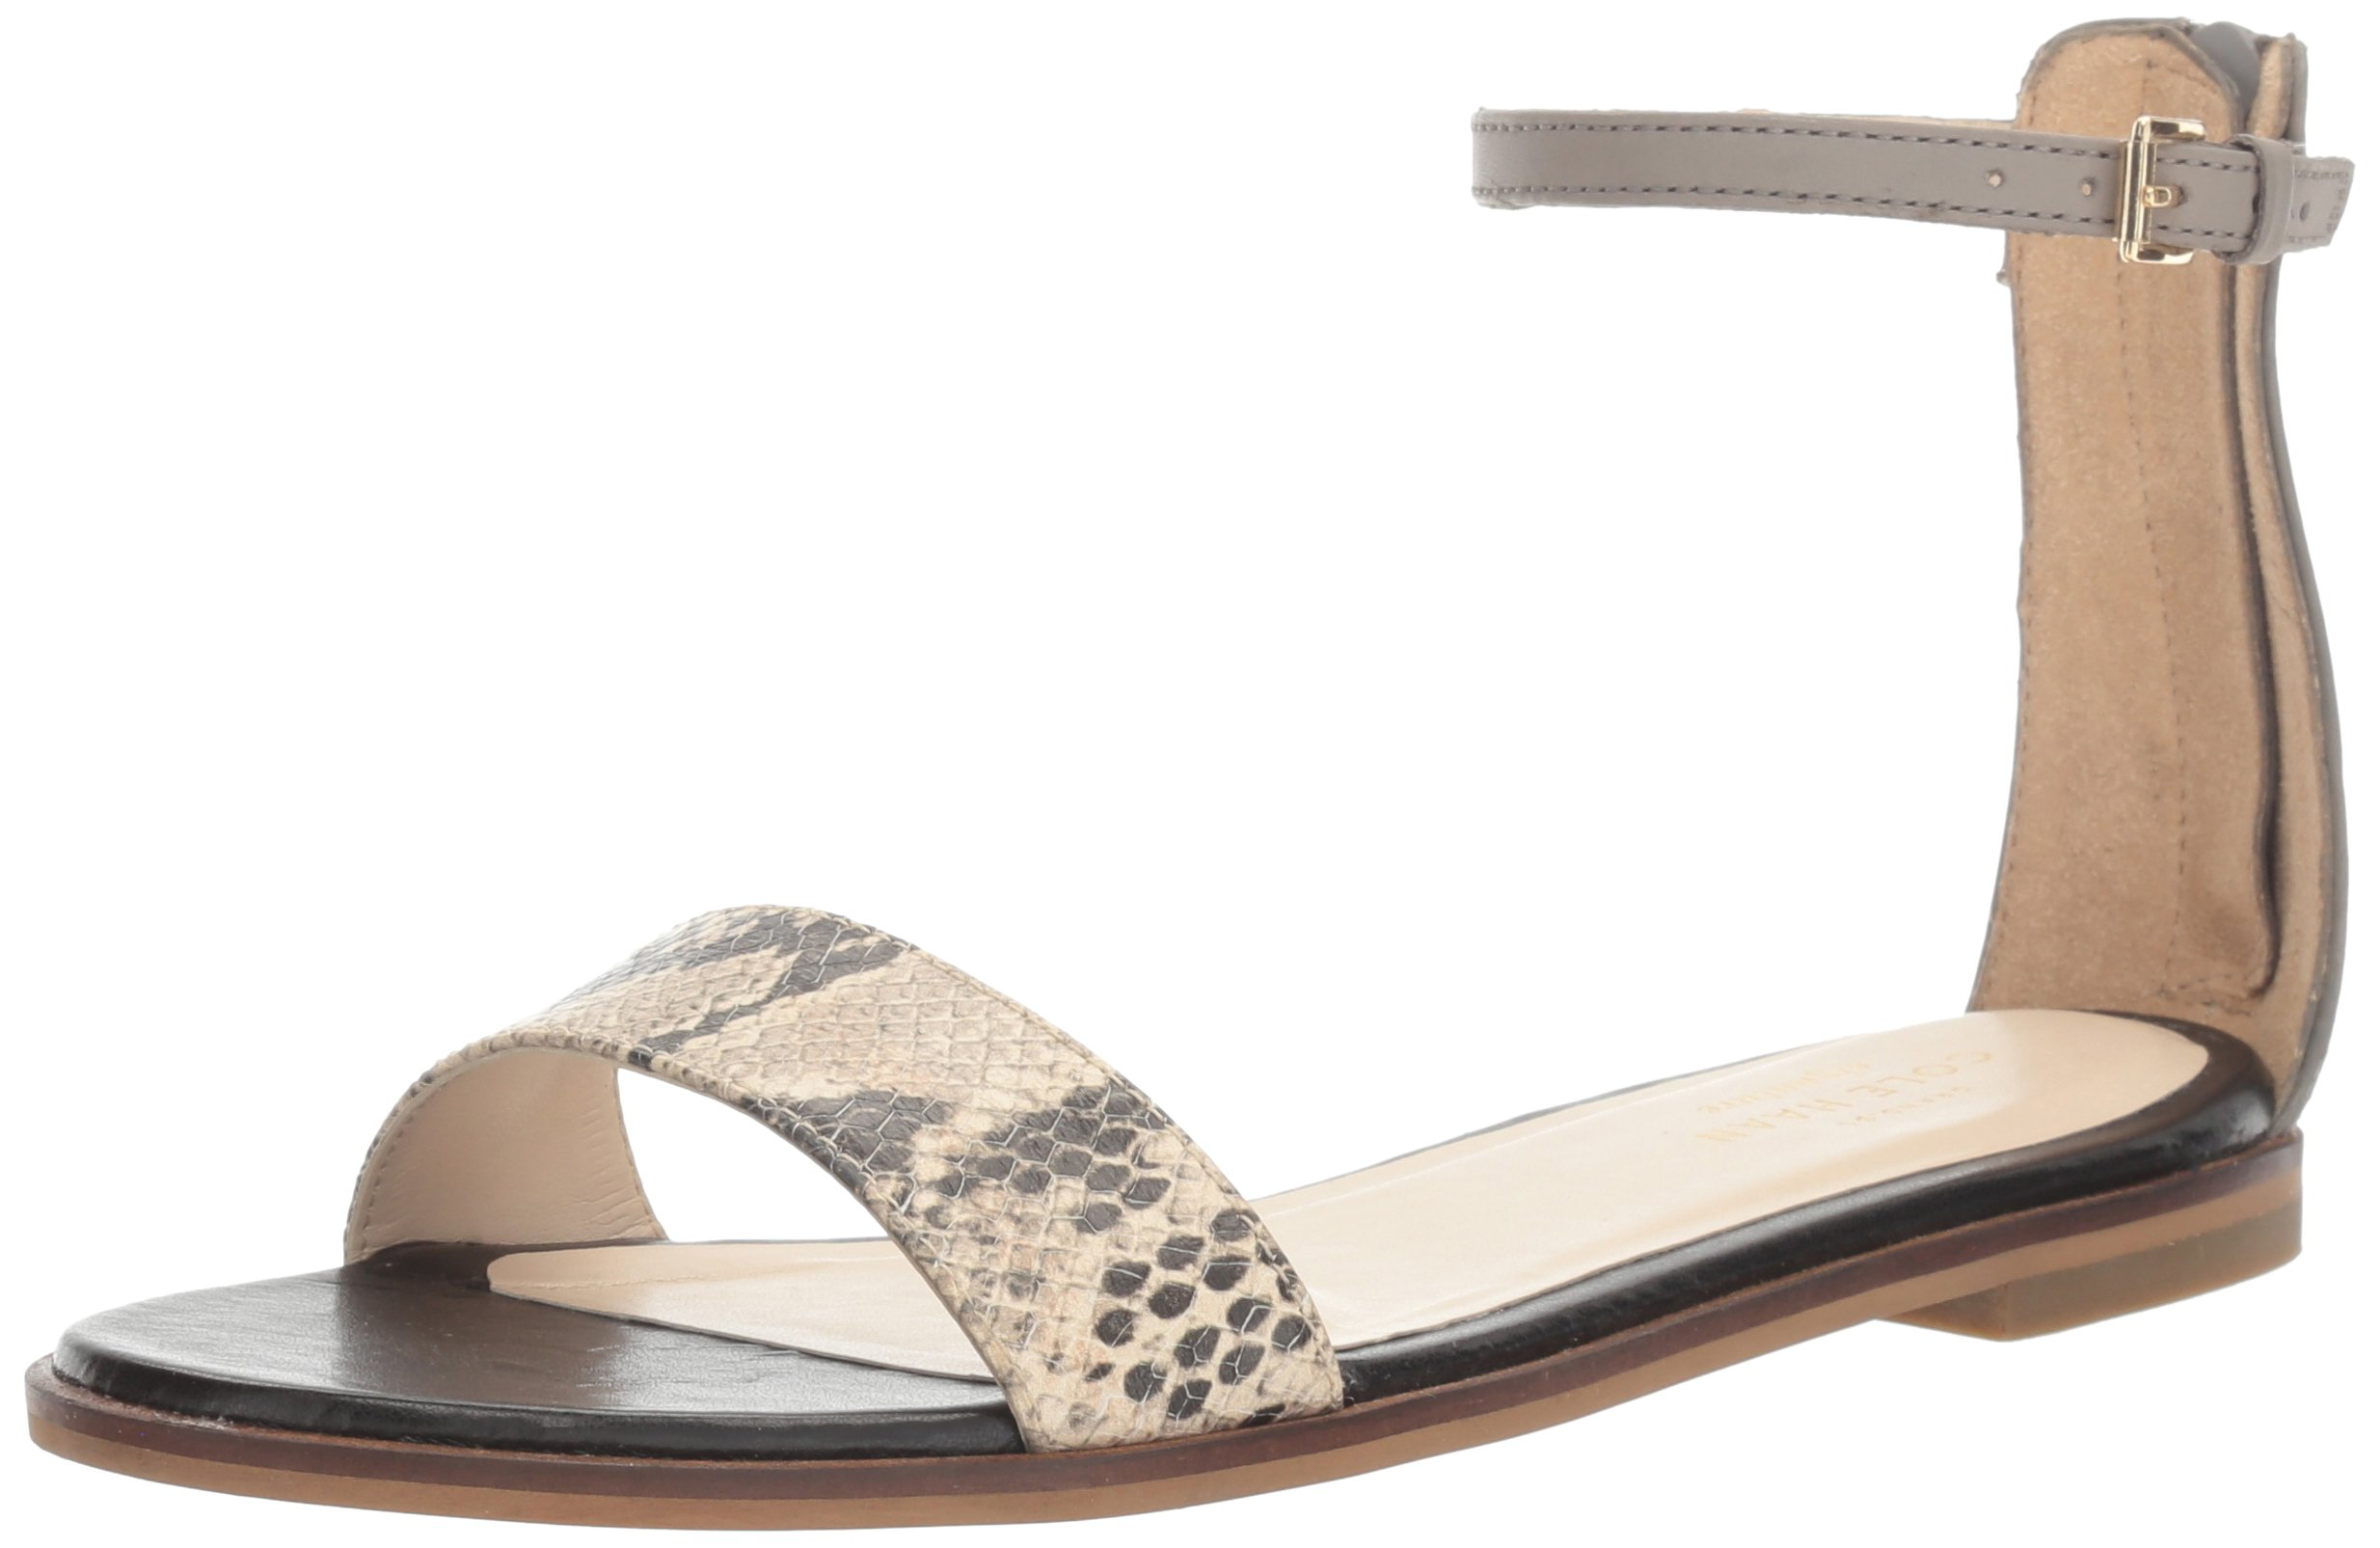 Cole Haan Women's Bayleen Ii Dress Sandal, Ironstone/Multi Snake Print, 10 B US